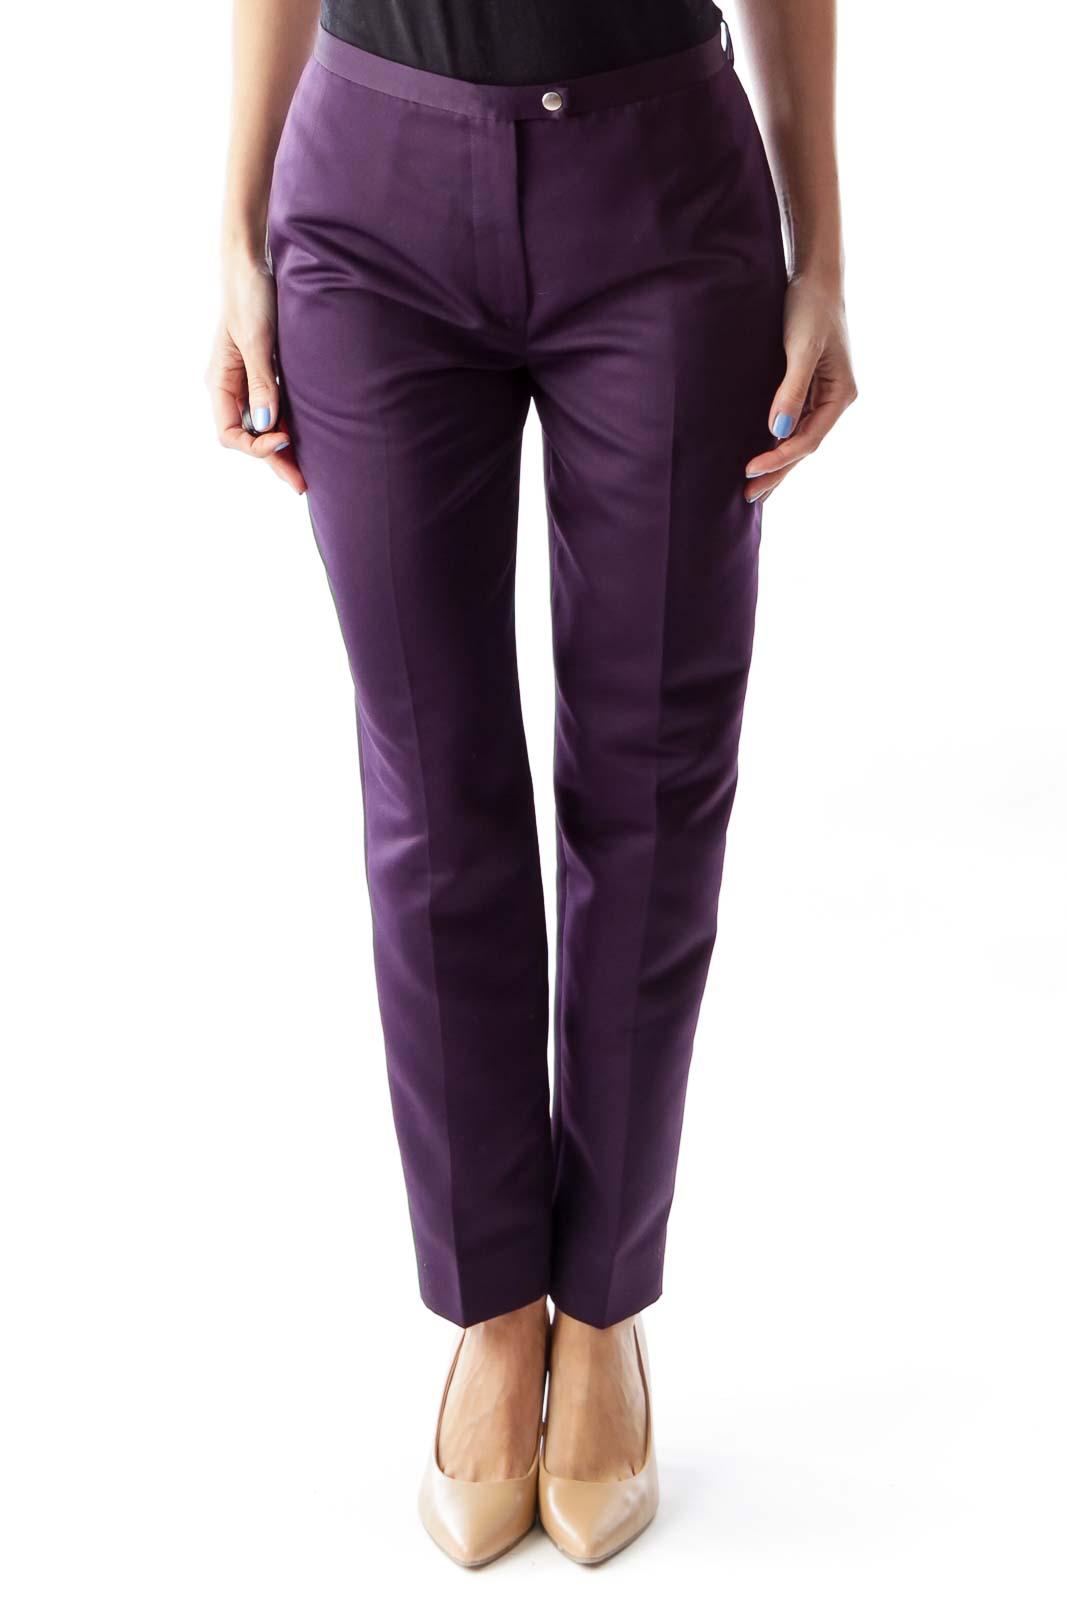 Purple Straight Pants Front